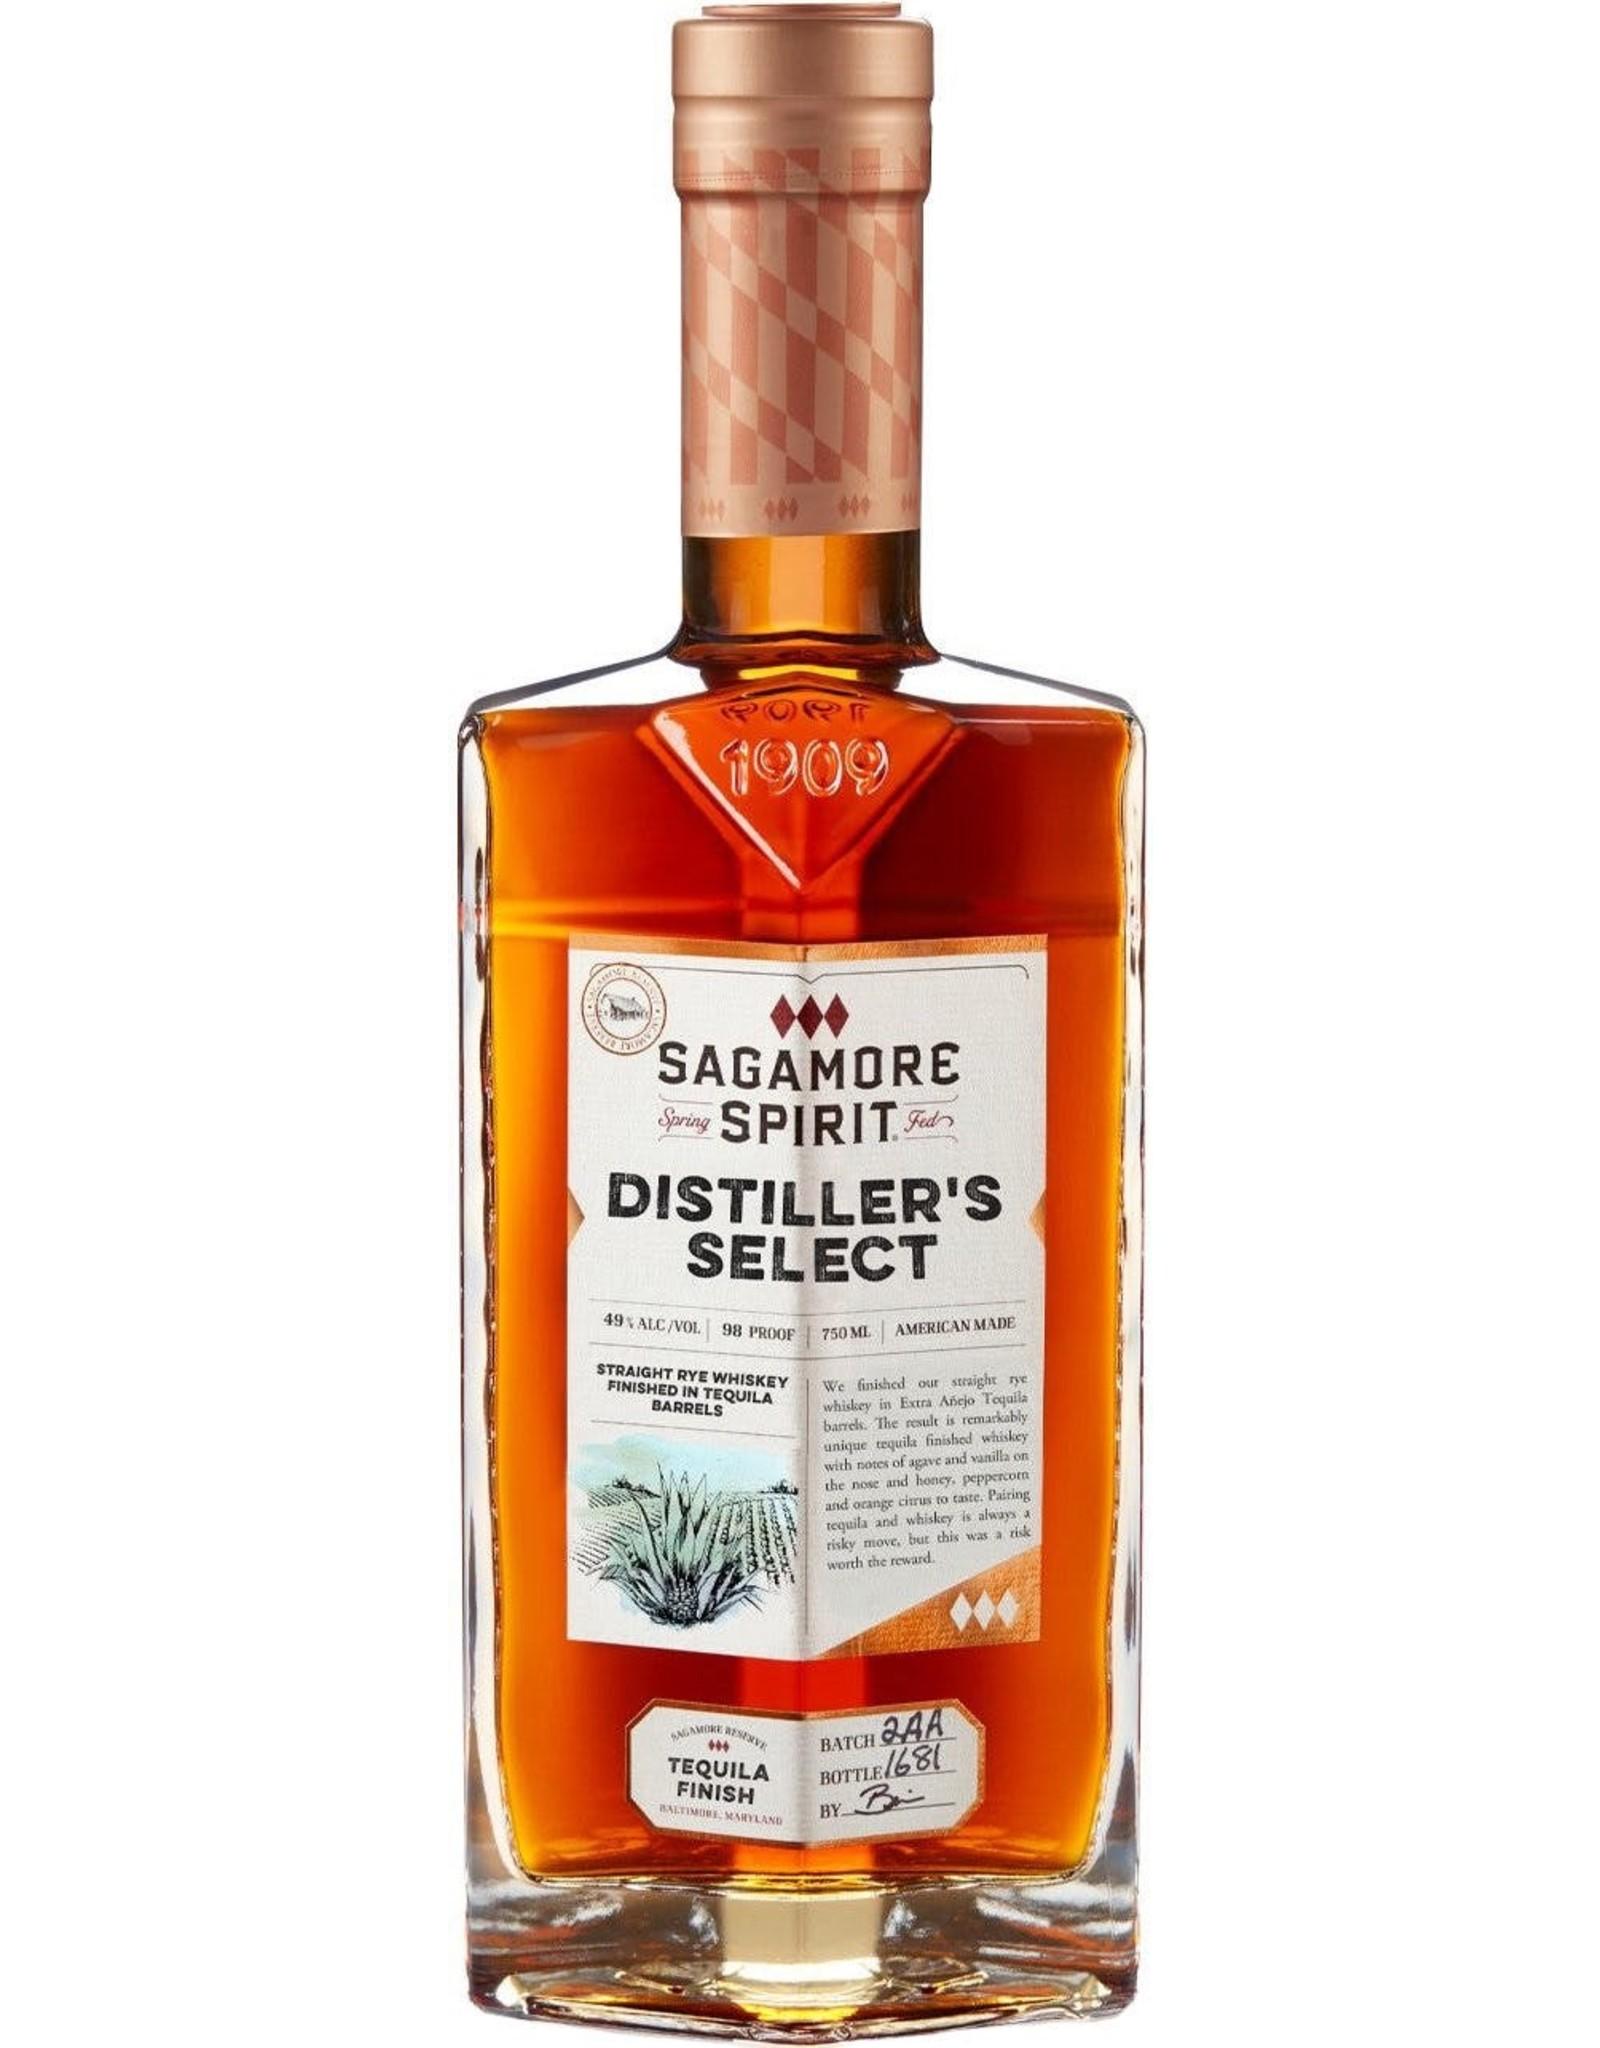 Sagamore Spirit Distiller's Select Tequila Finish Rye